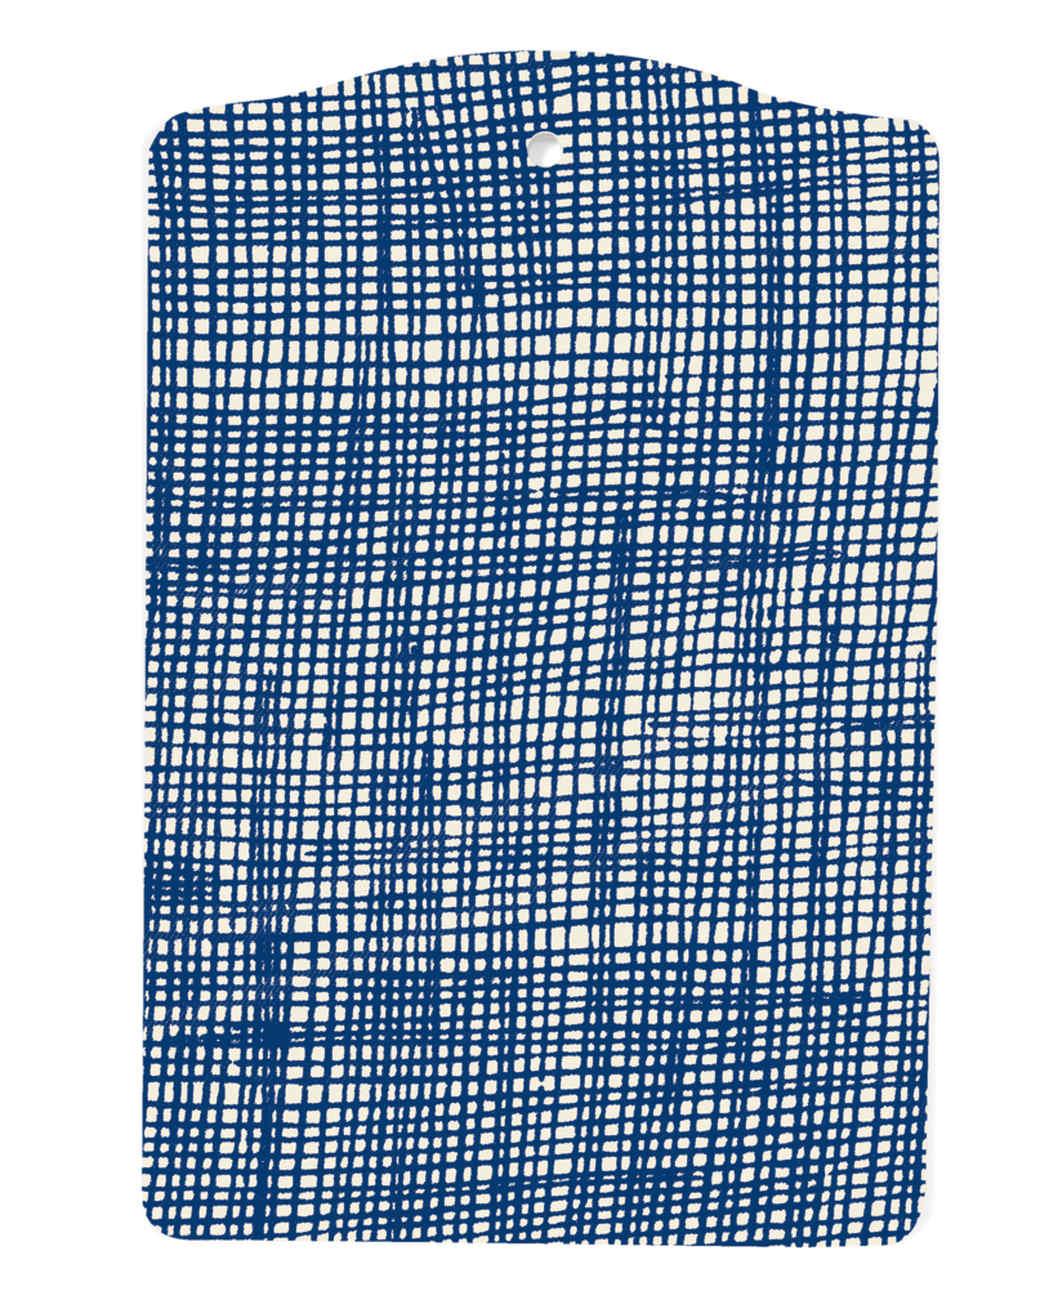 checkered-cutting-board-ms108197.jpg